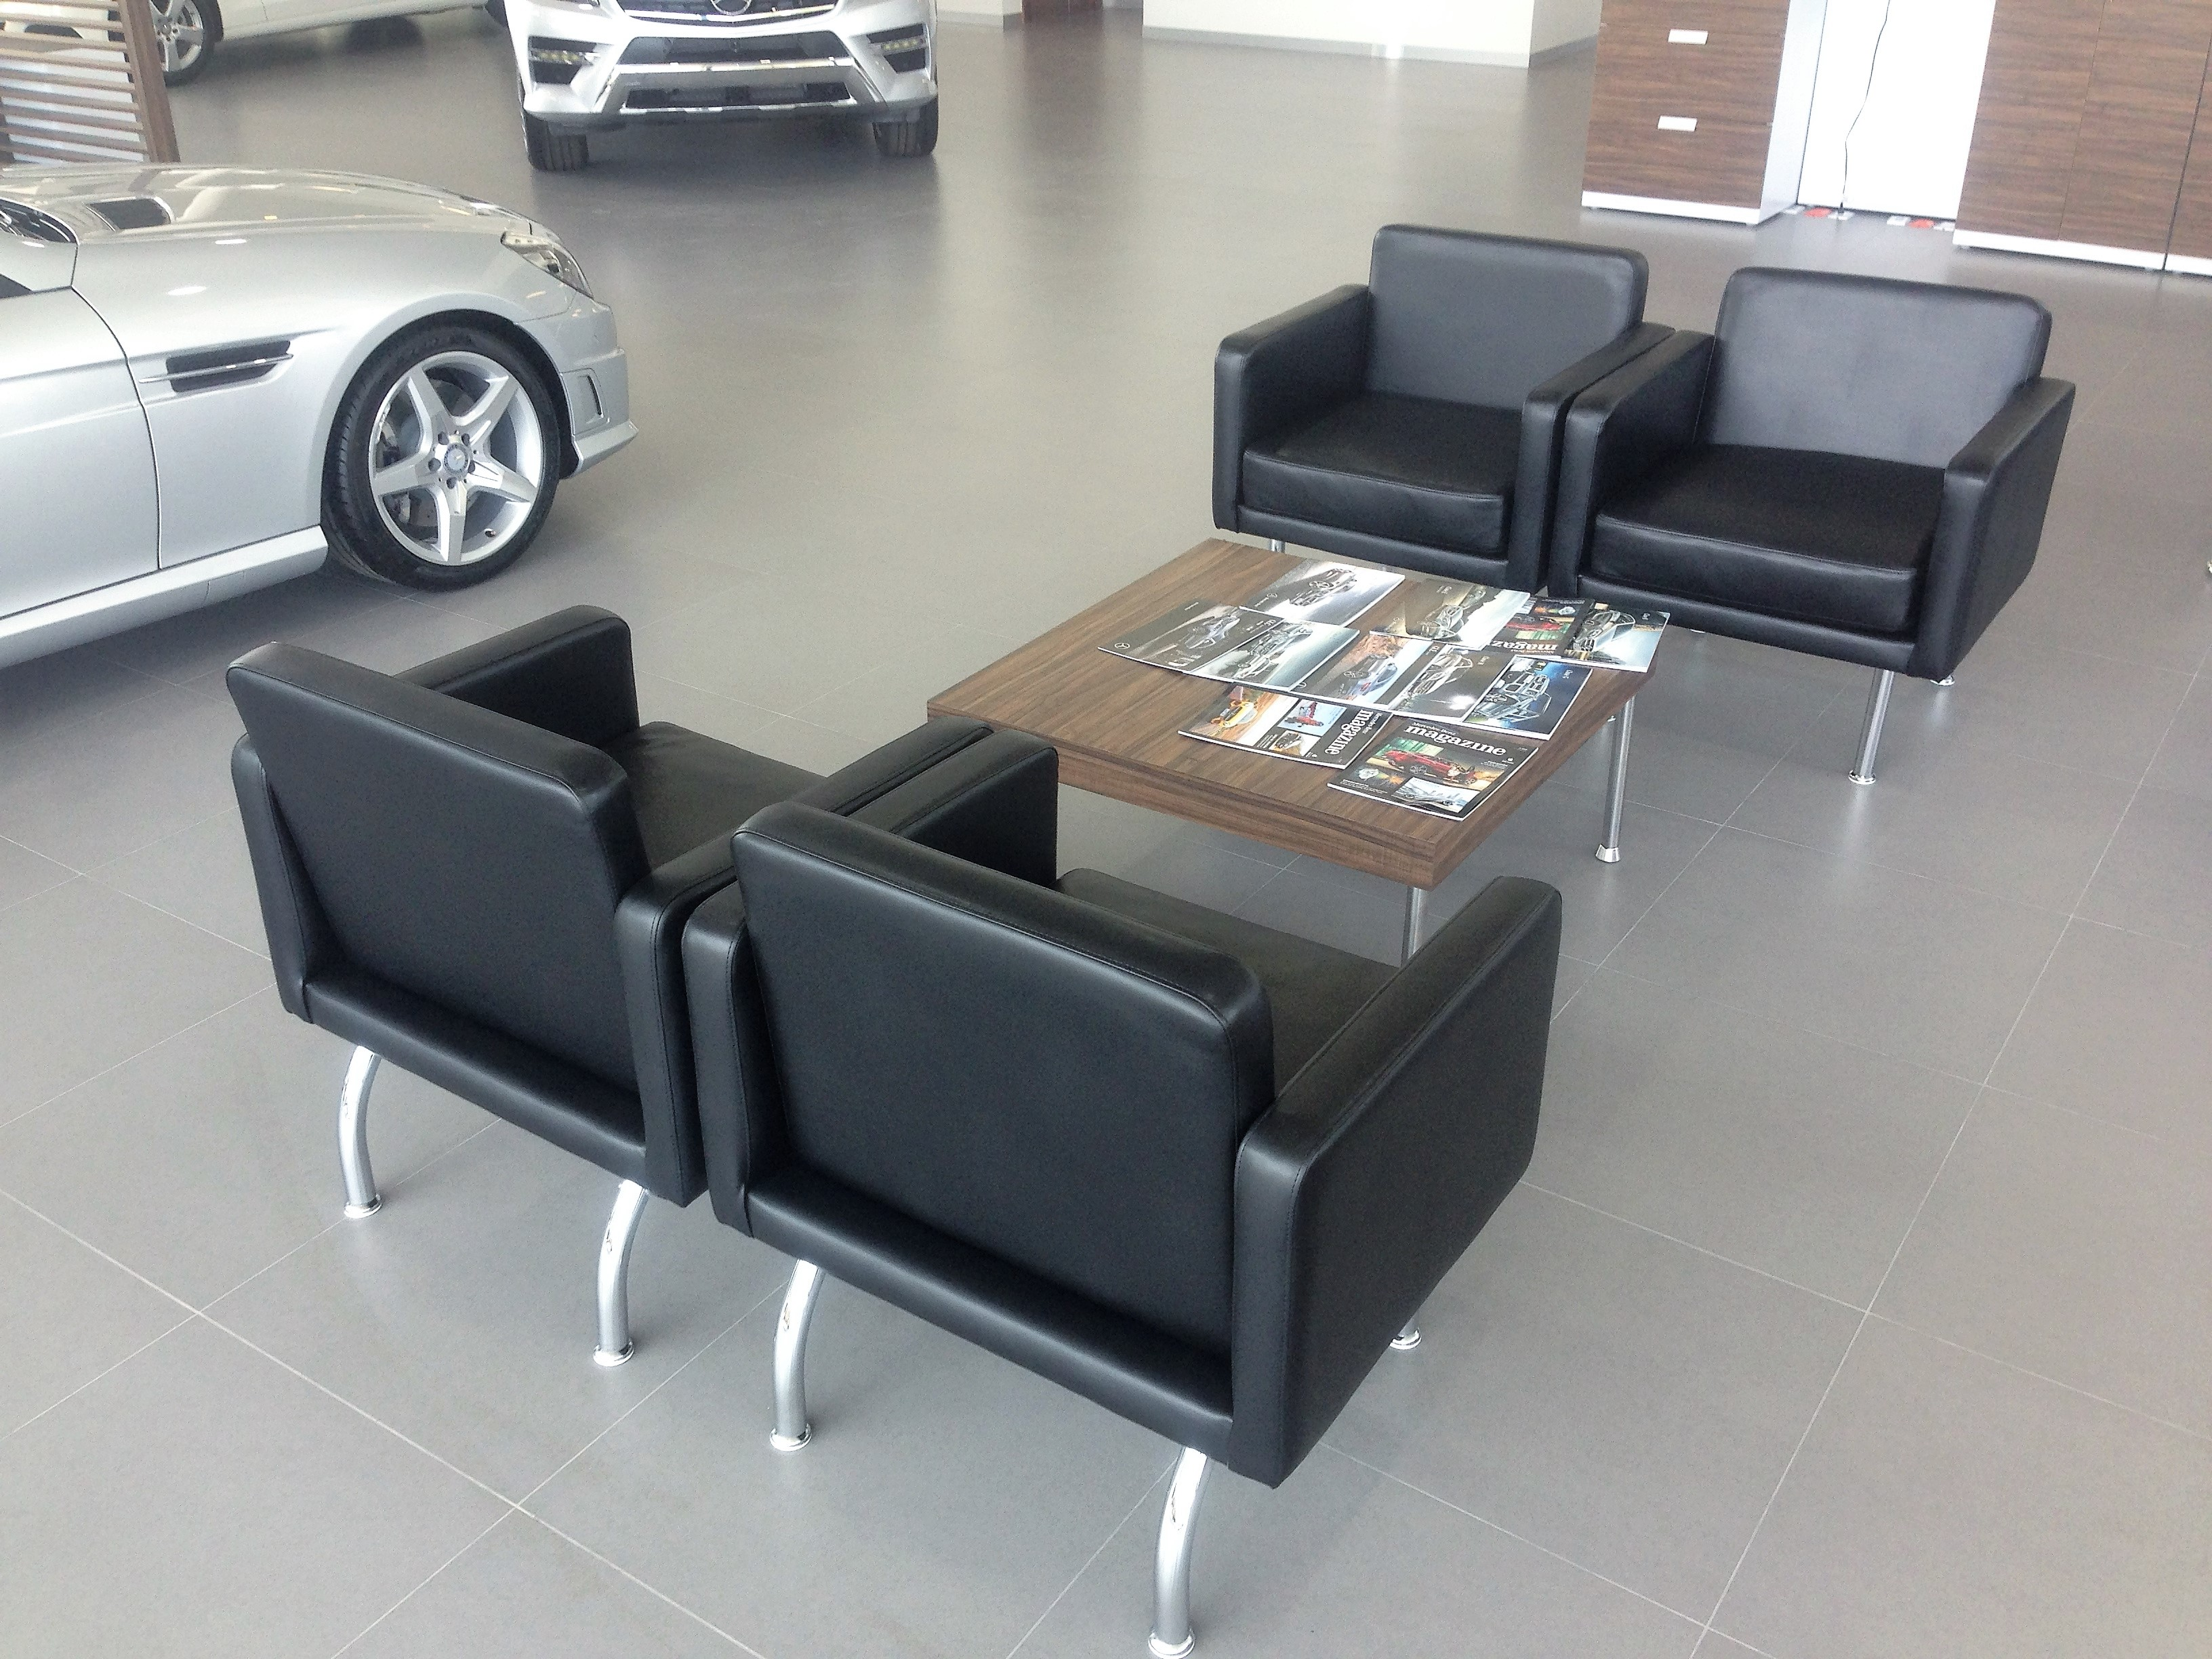 Mobiliario corporativo dise o y manufactura de muebles for Oficina qualitas auto